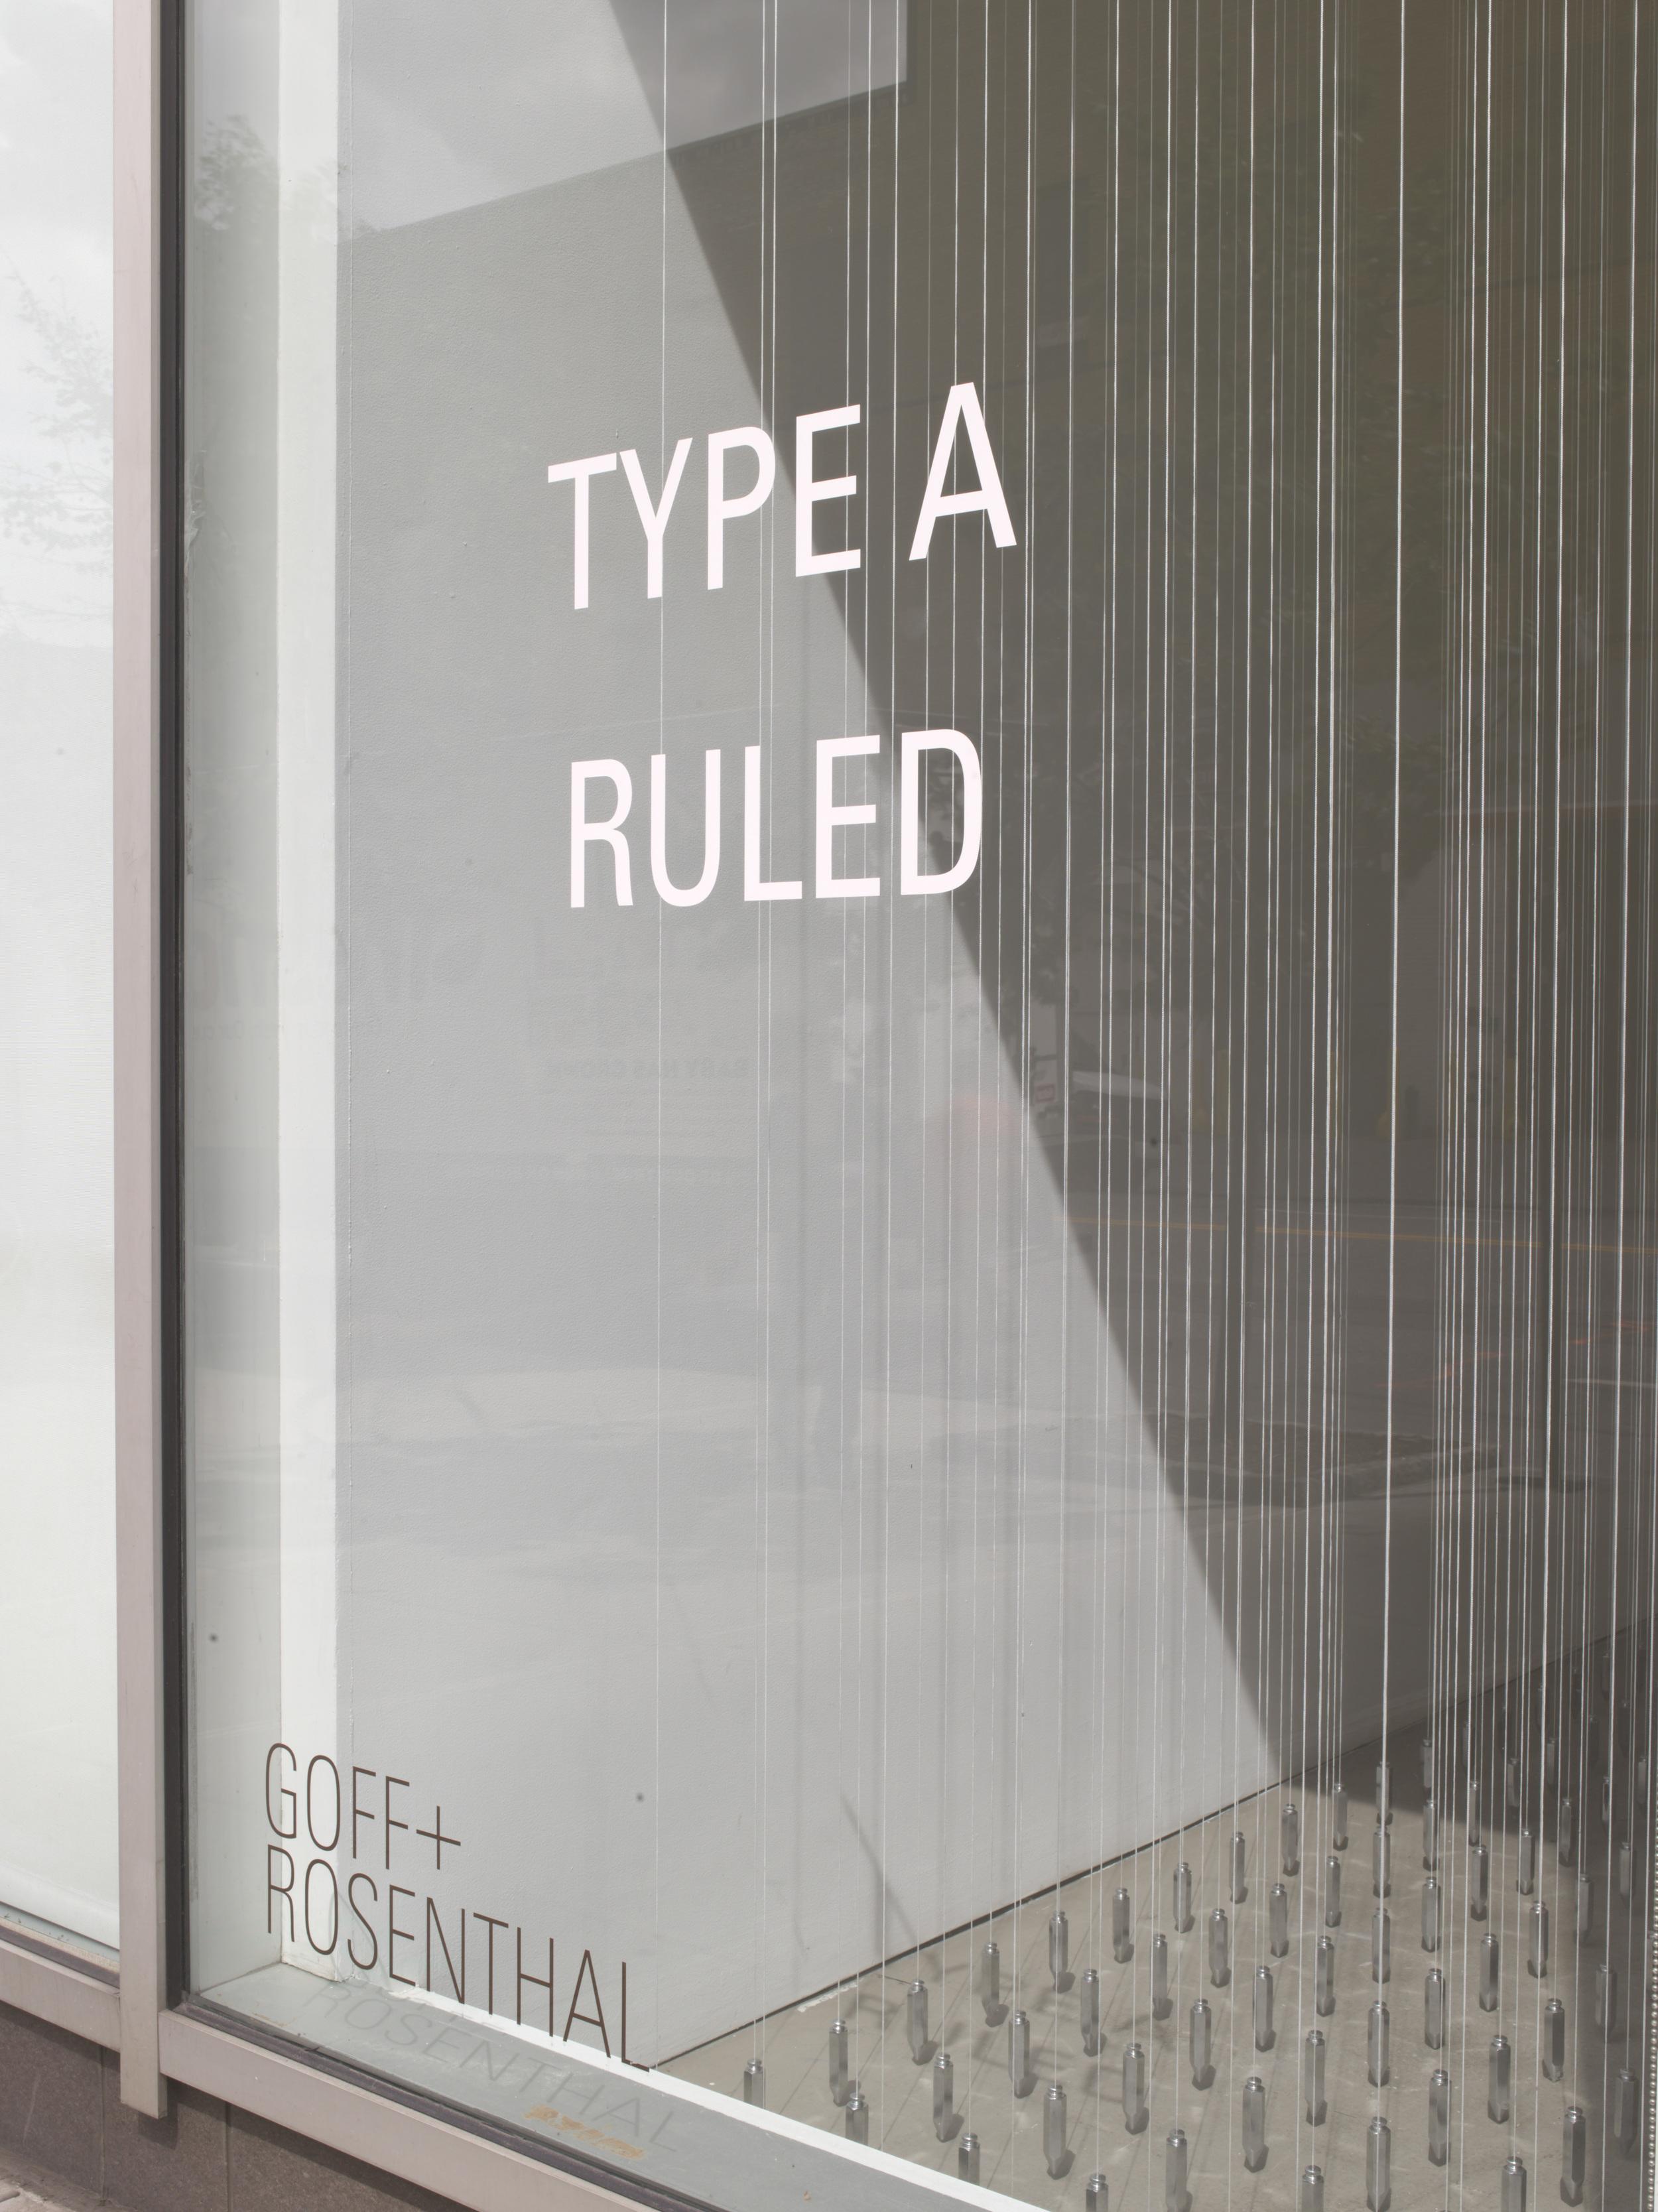 typea_ruled_install_detail_1_00028-1.jpg